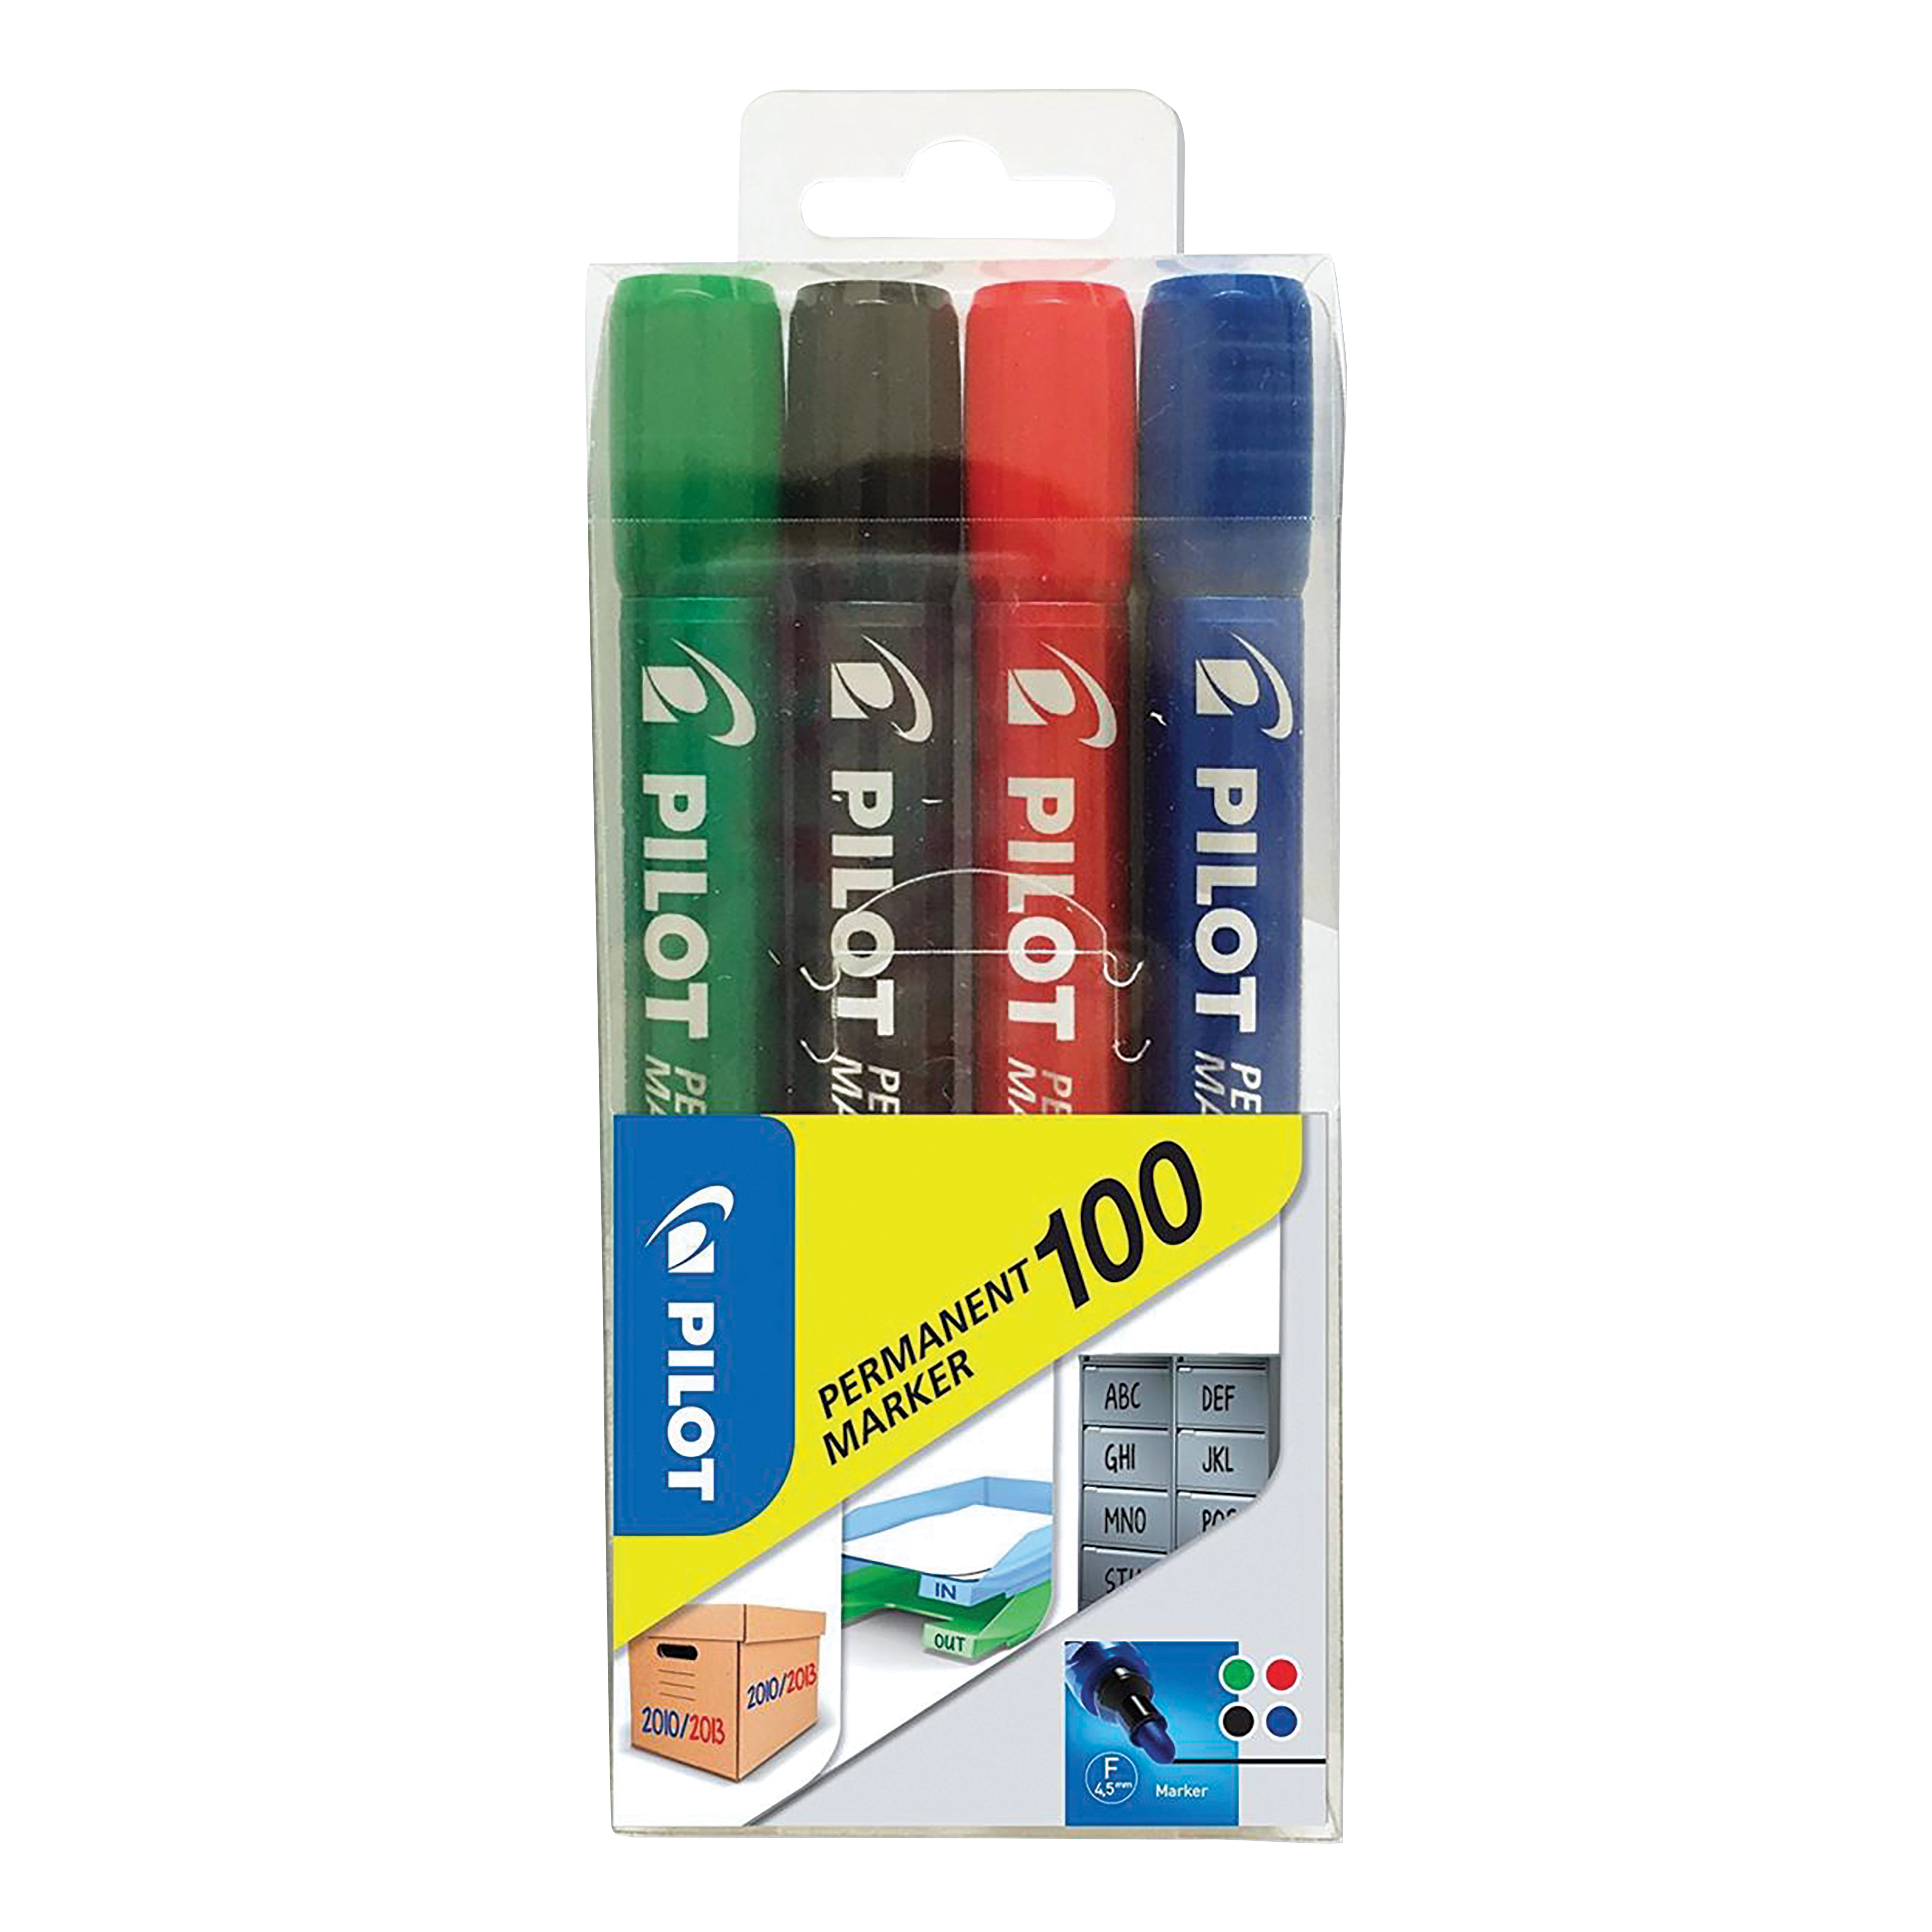 Pilot 100 Permanent Marker Bullet Tip 1mm Line Asstd Black/Blue/Red/Green Ref 3131910501725 Pack 4